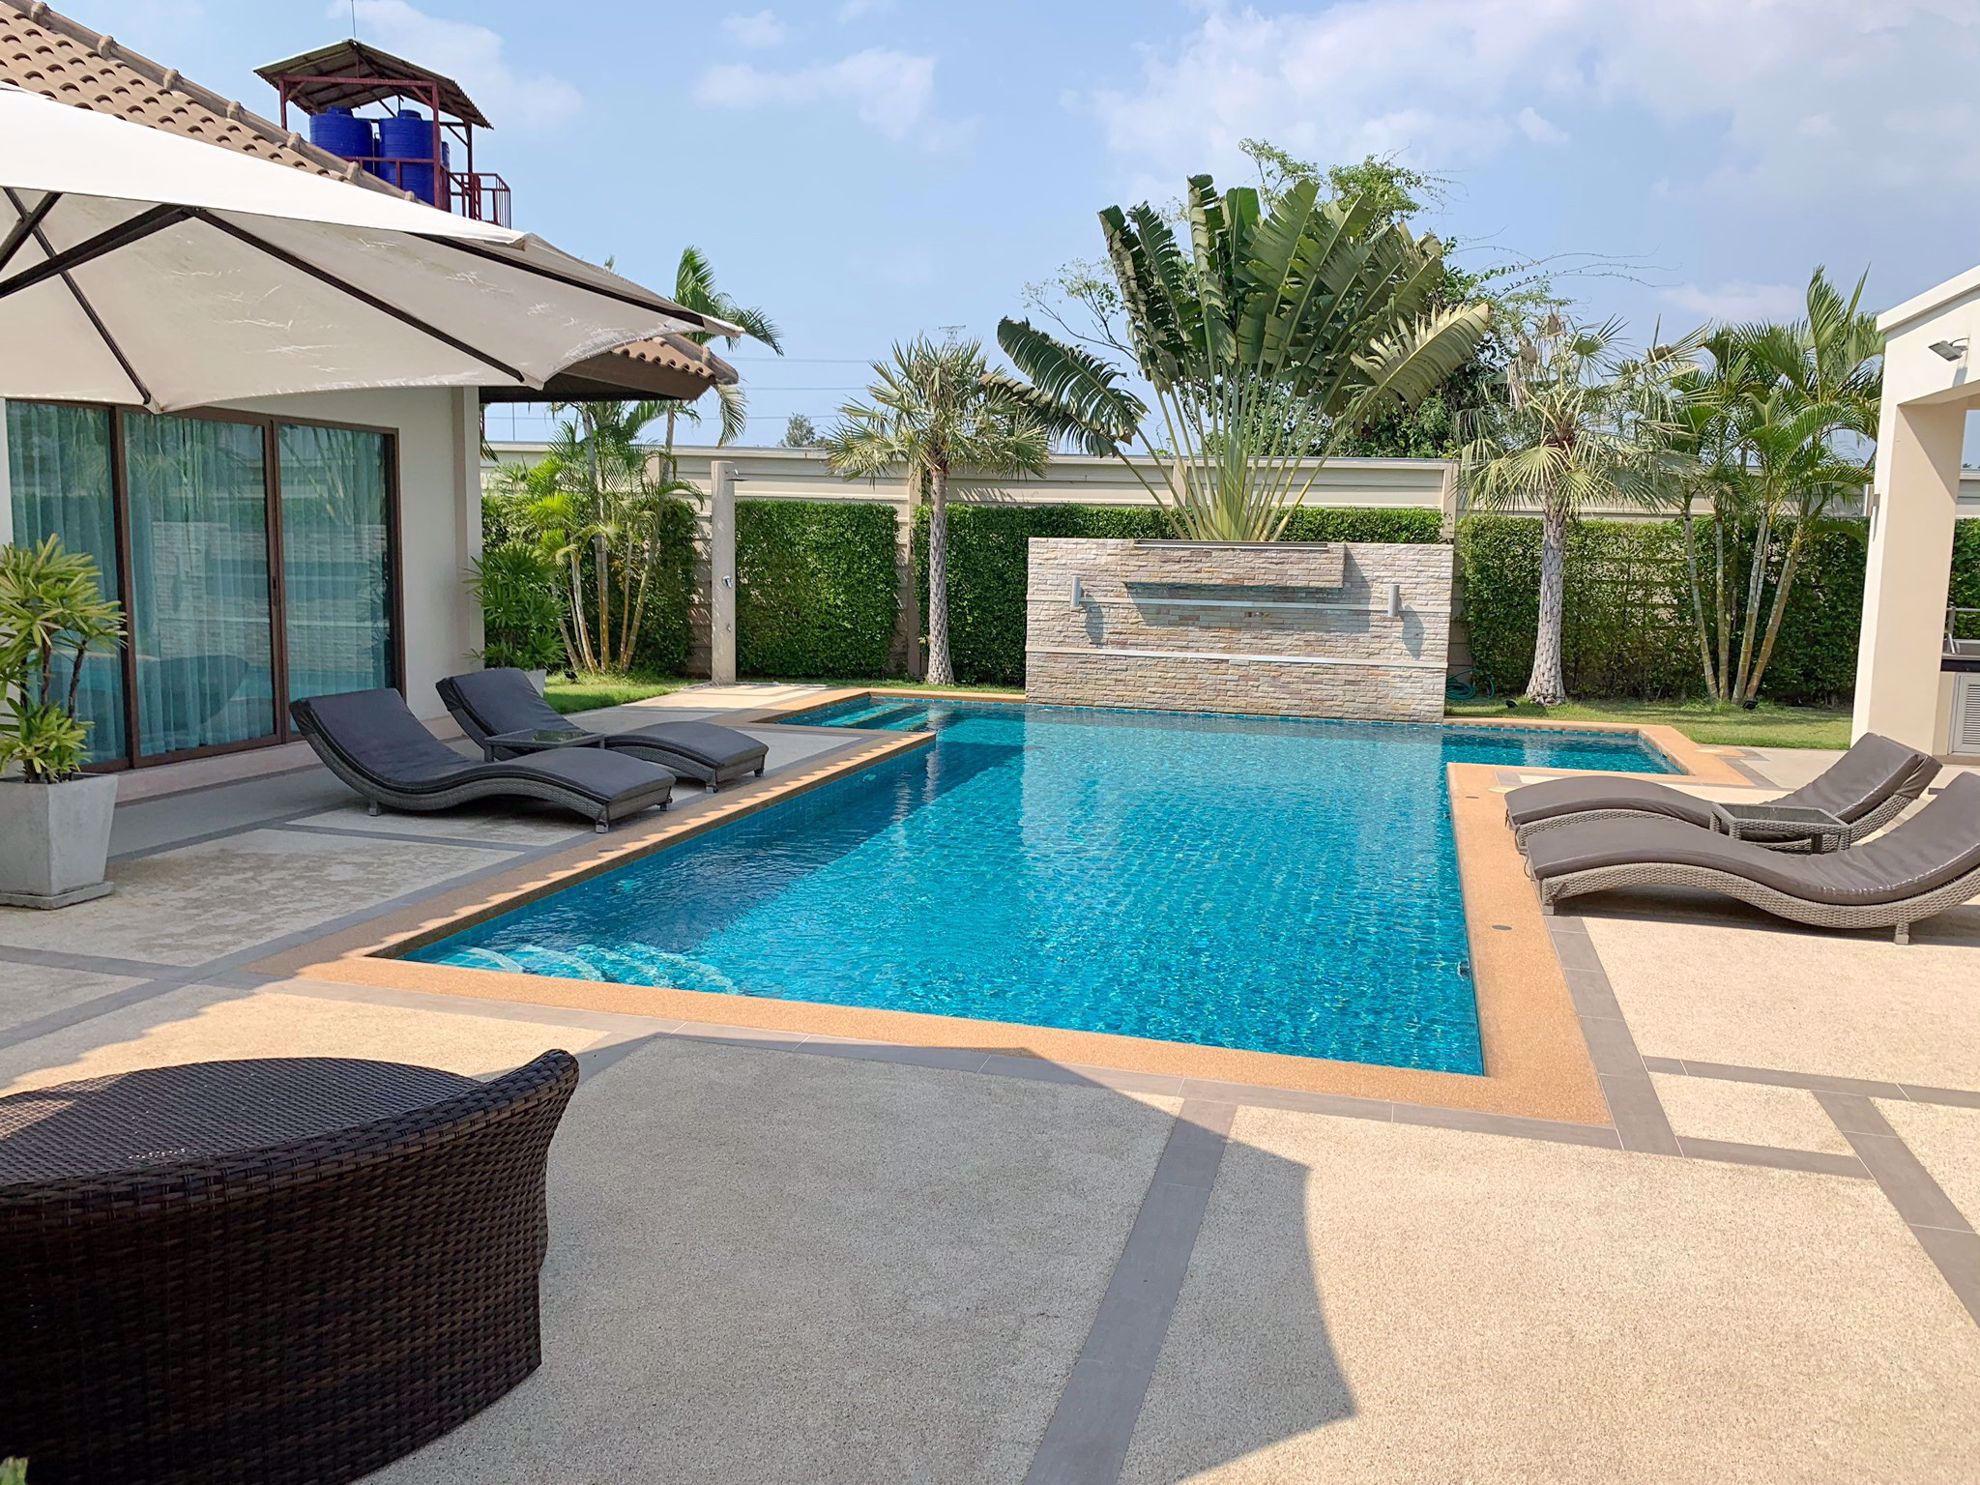 4 Bedroom House in Baan Balina 4 in Huay Yai H002136